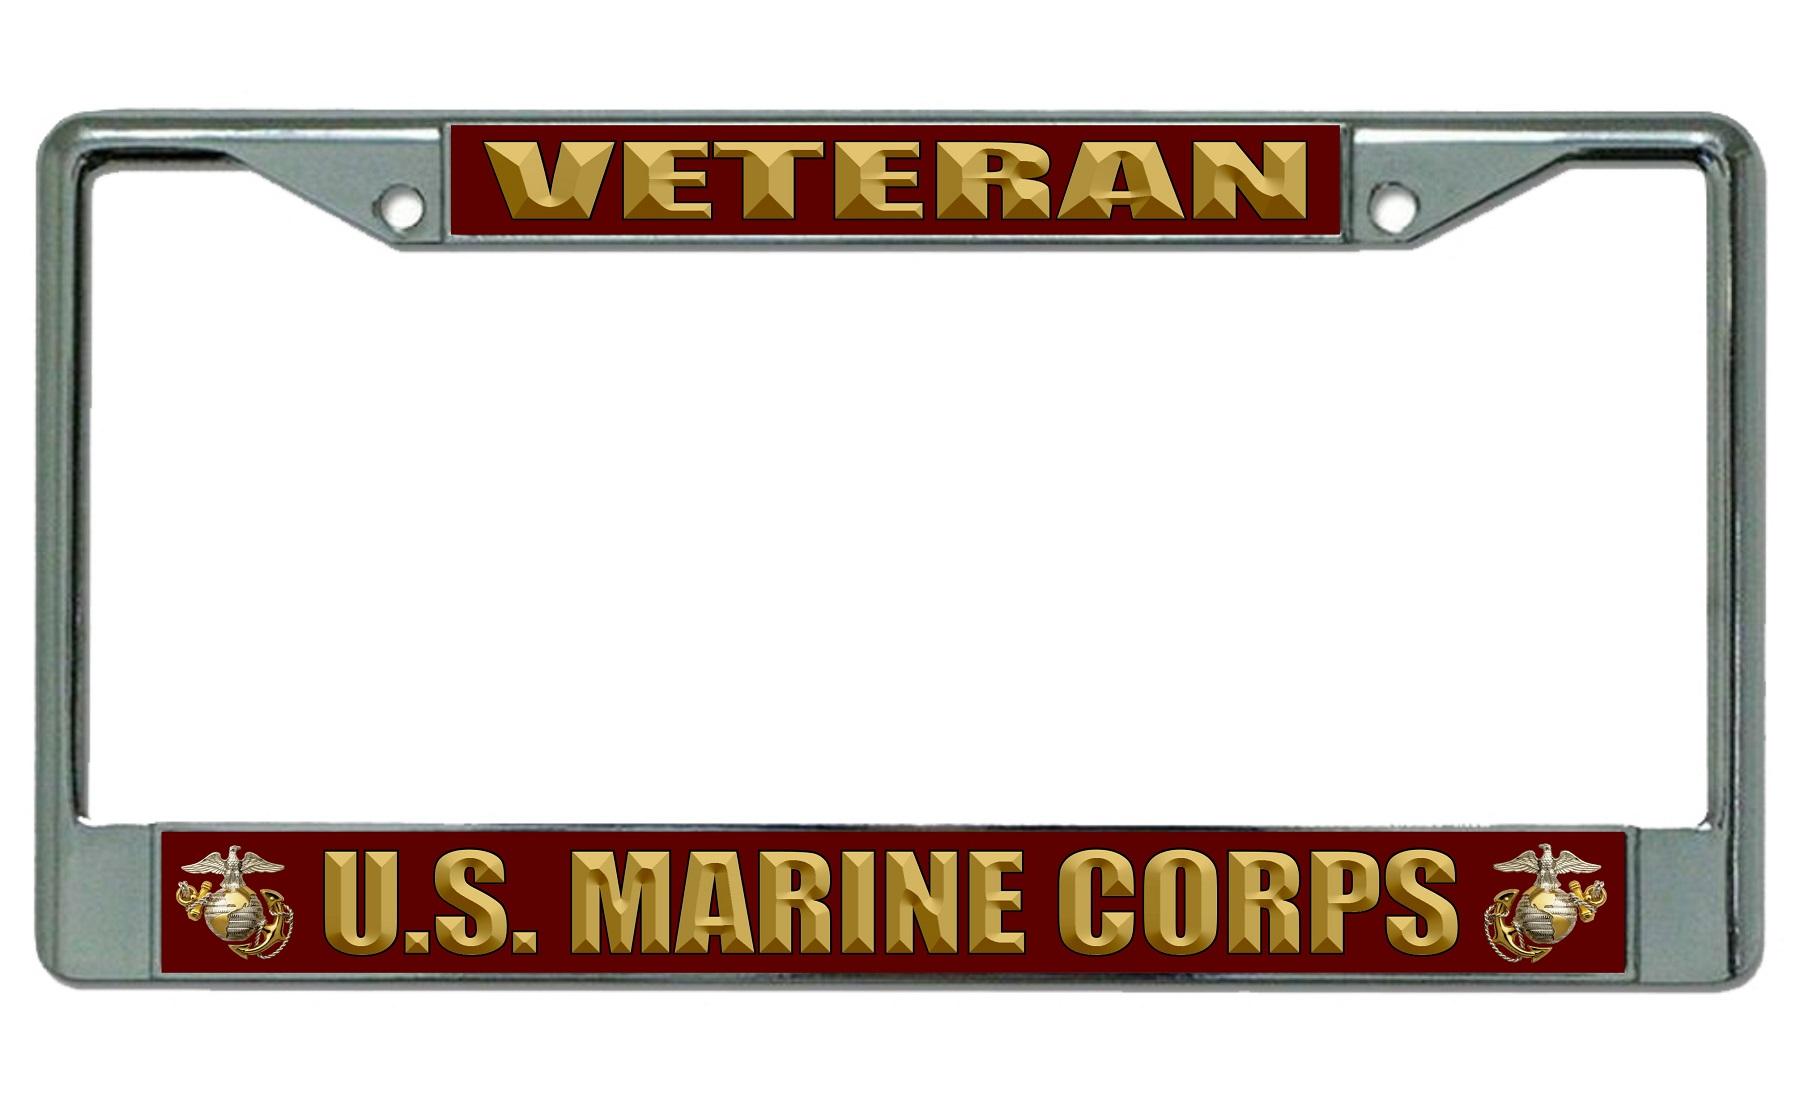 U.S. Marine Corps Veteran Chrome License Plate Frame U.S. Marines ...